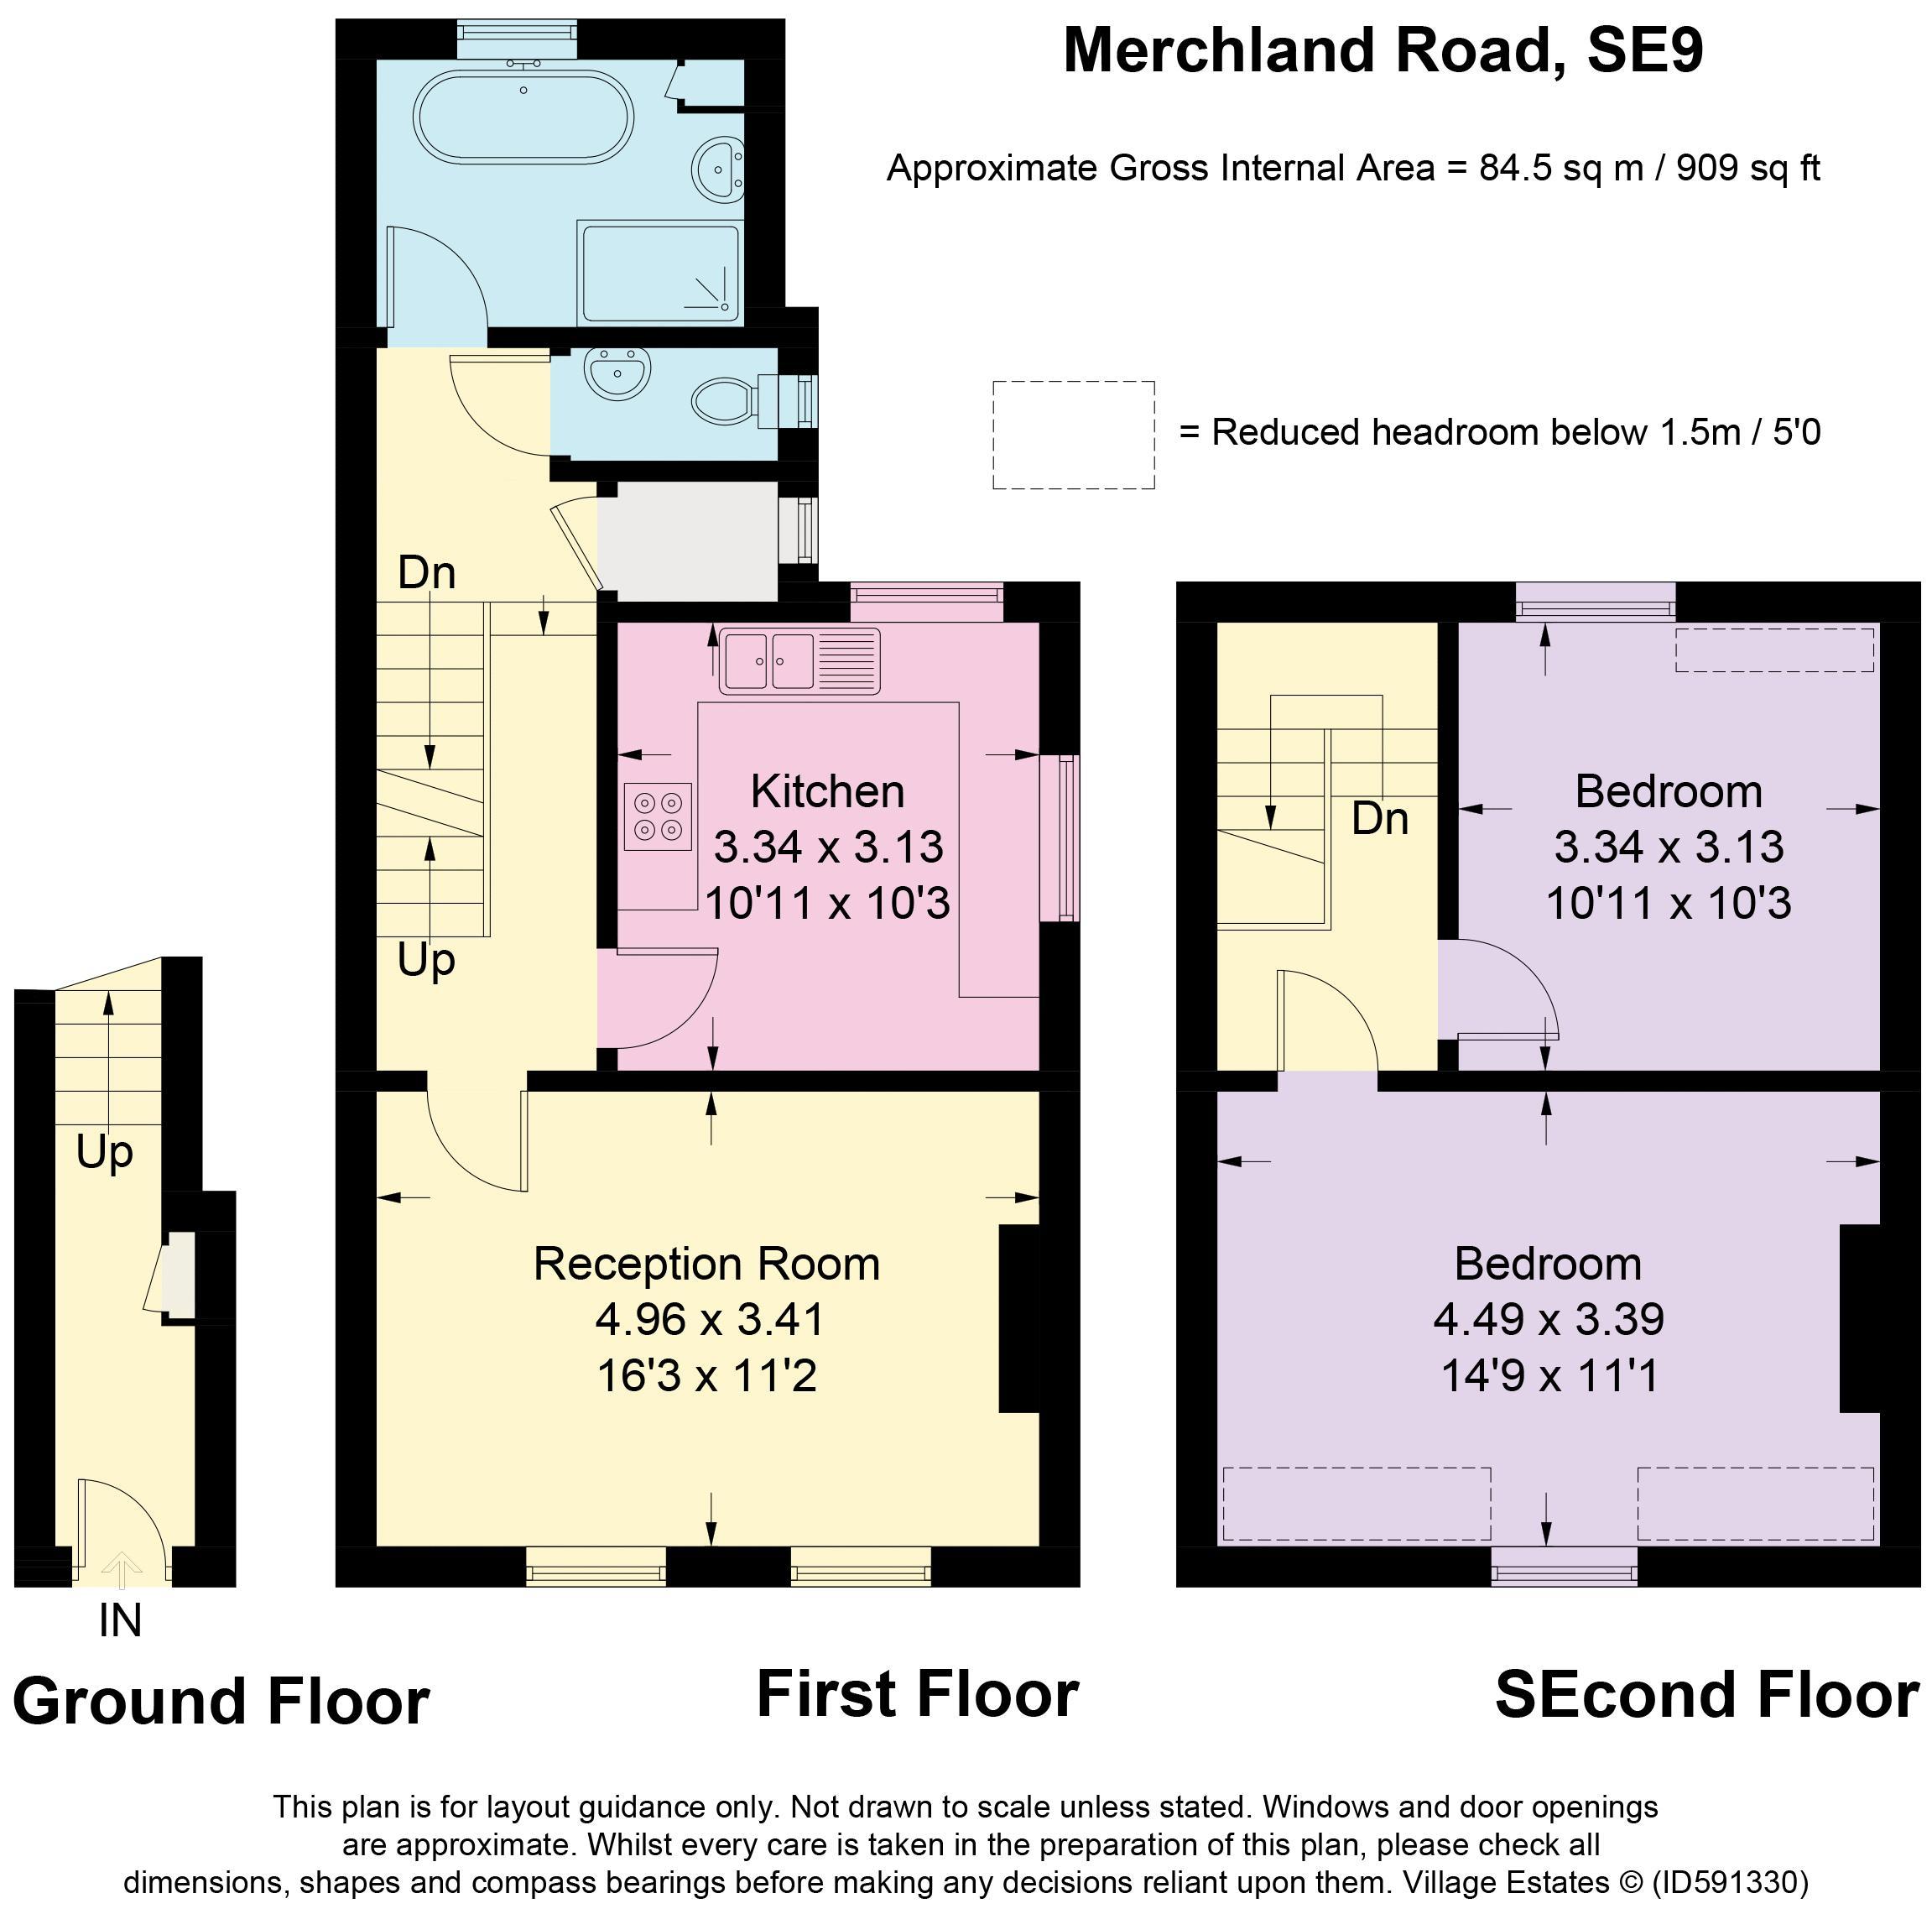 Merchland Road Floorplan